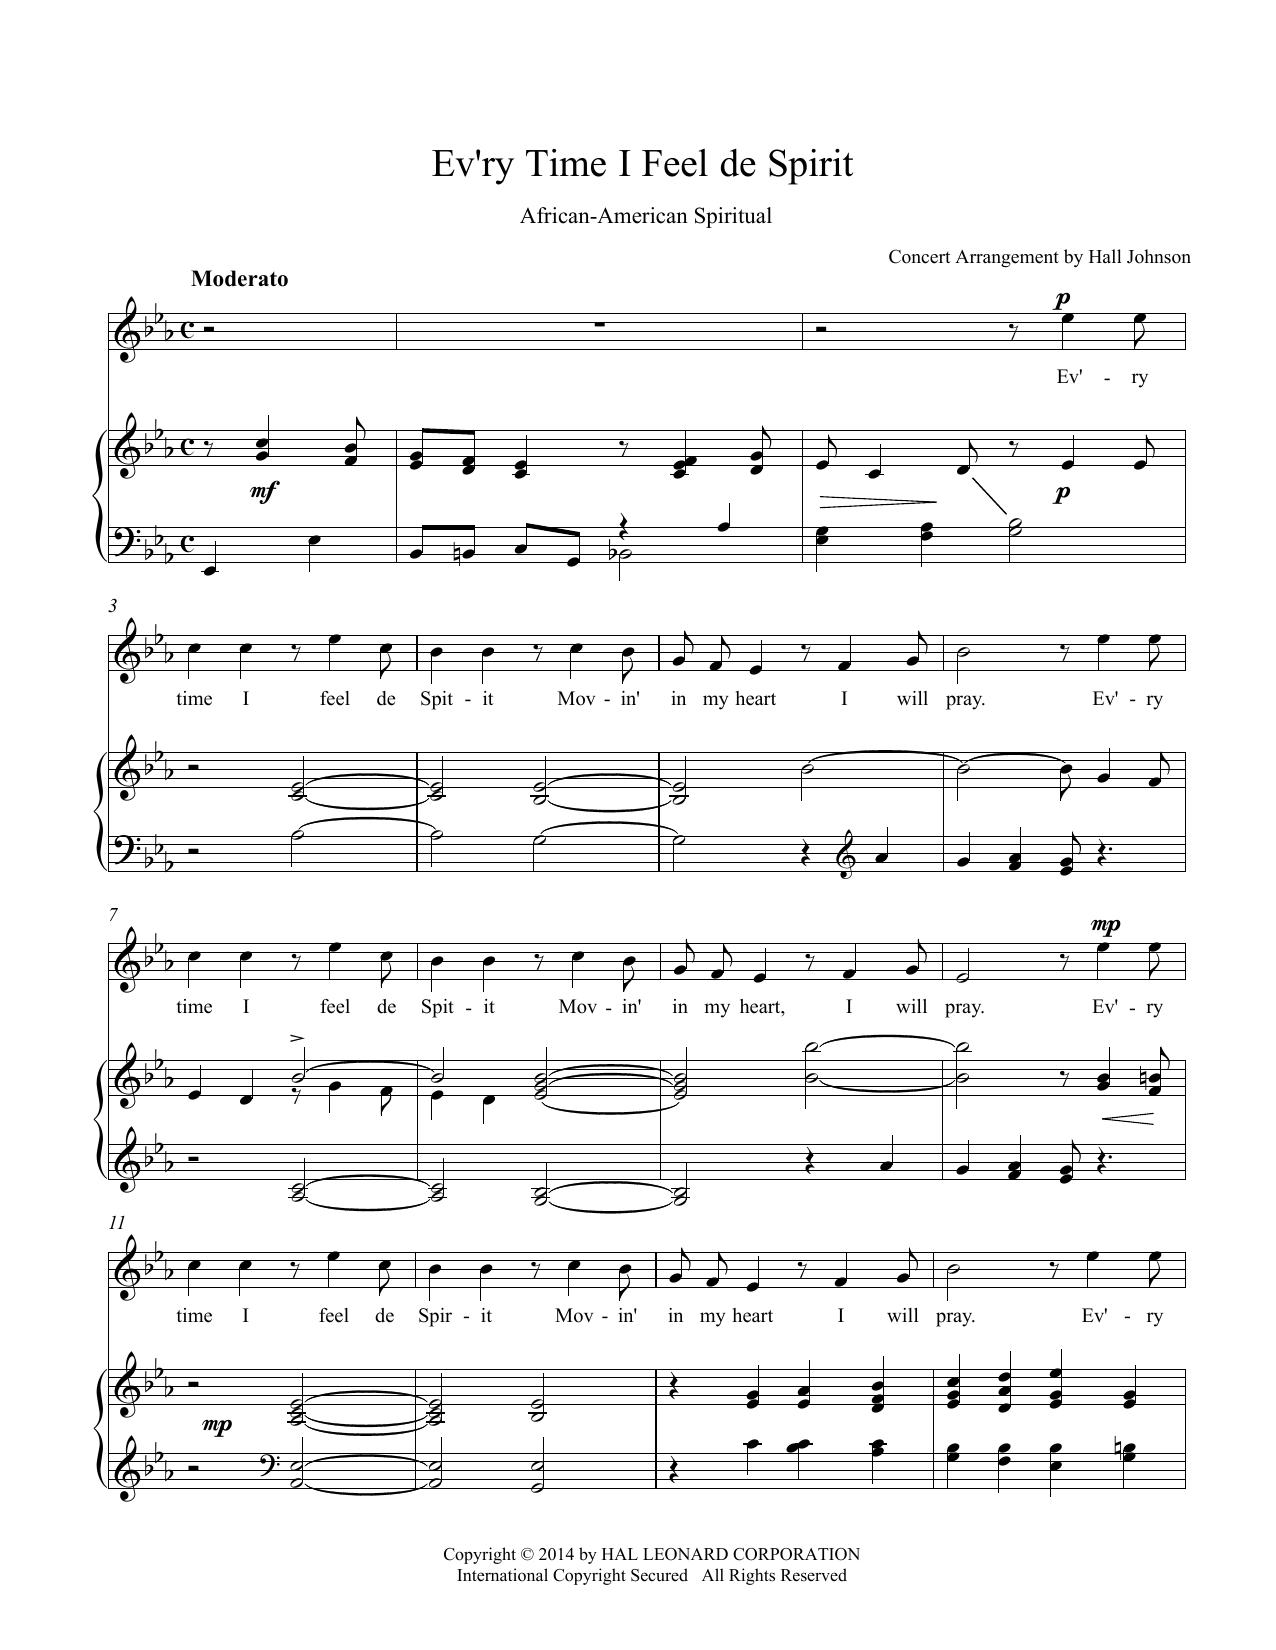 Ev'ry Time I Feel de Spirit (E-flat) Sheet Music